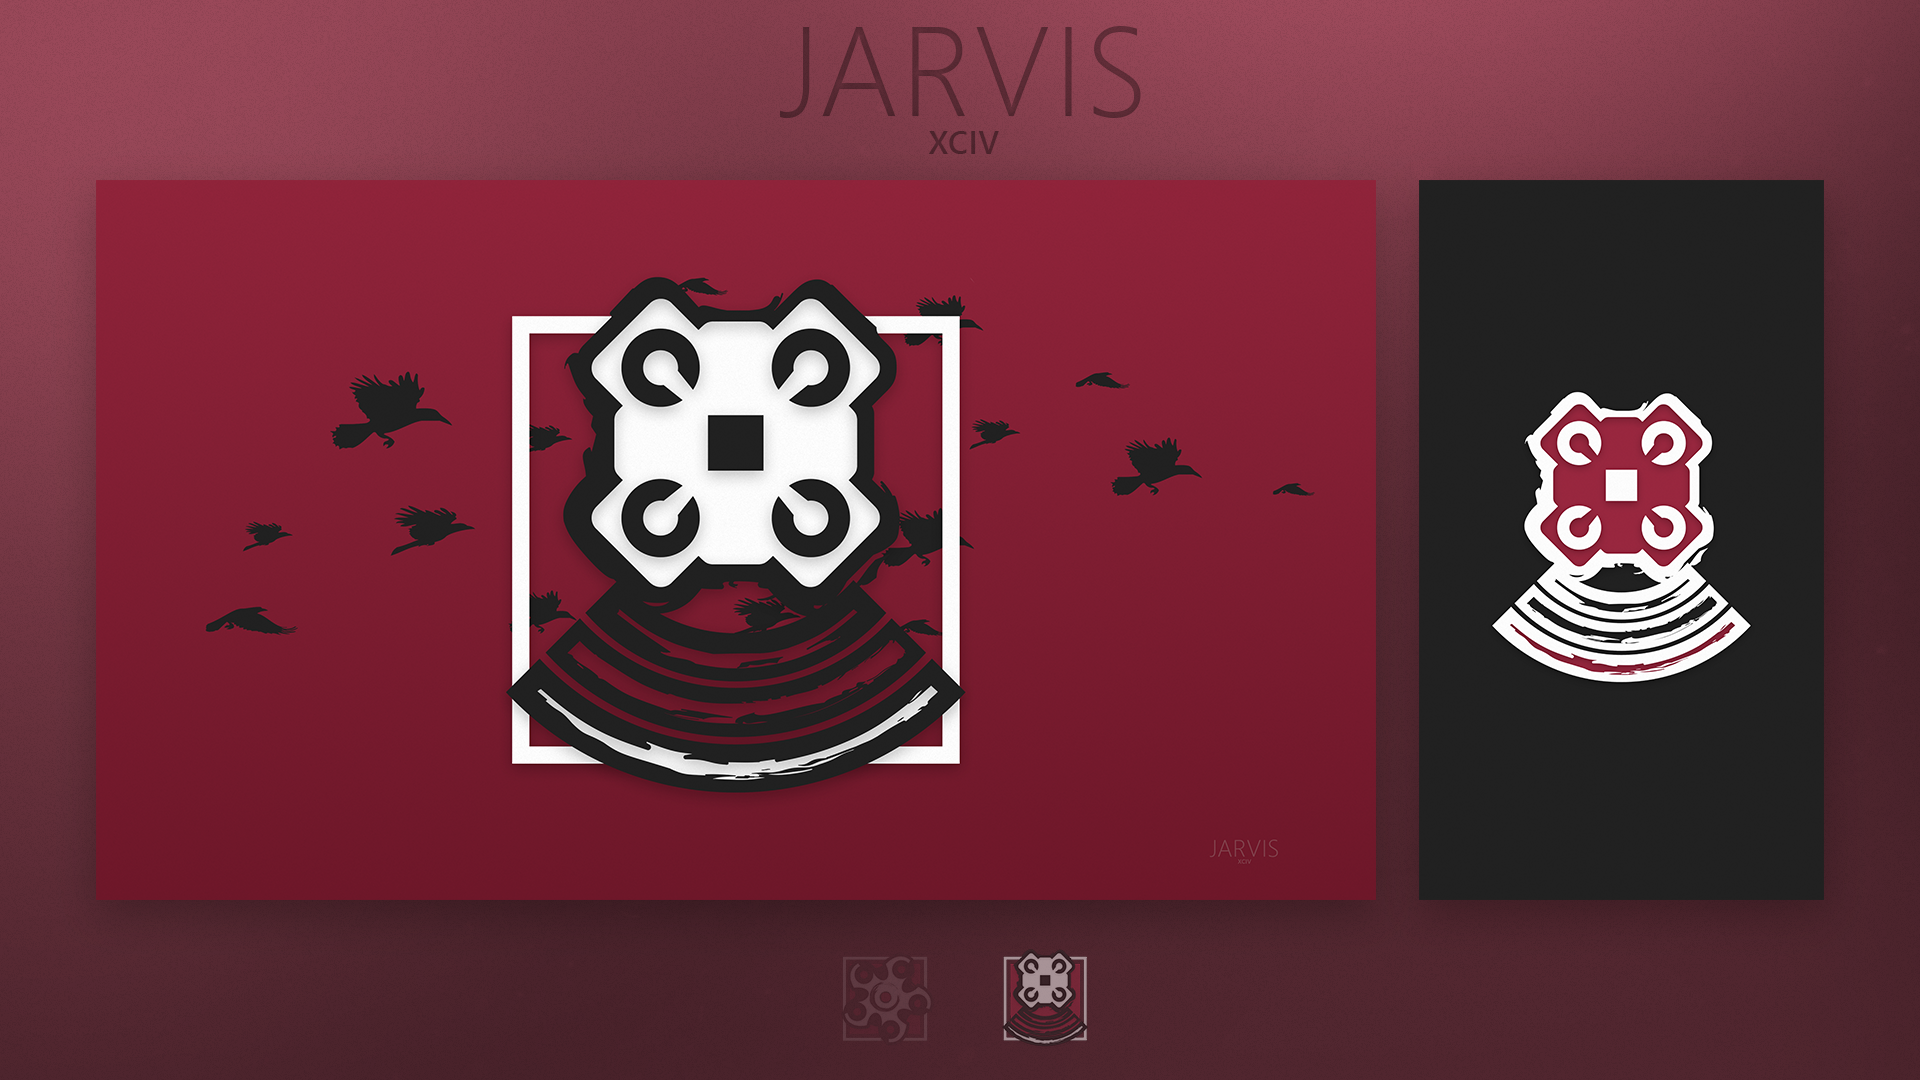 Echo Icon Wallpaper Pack by JarvisXCIV on DeviantArt